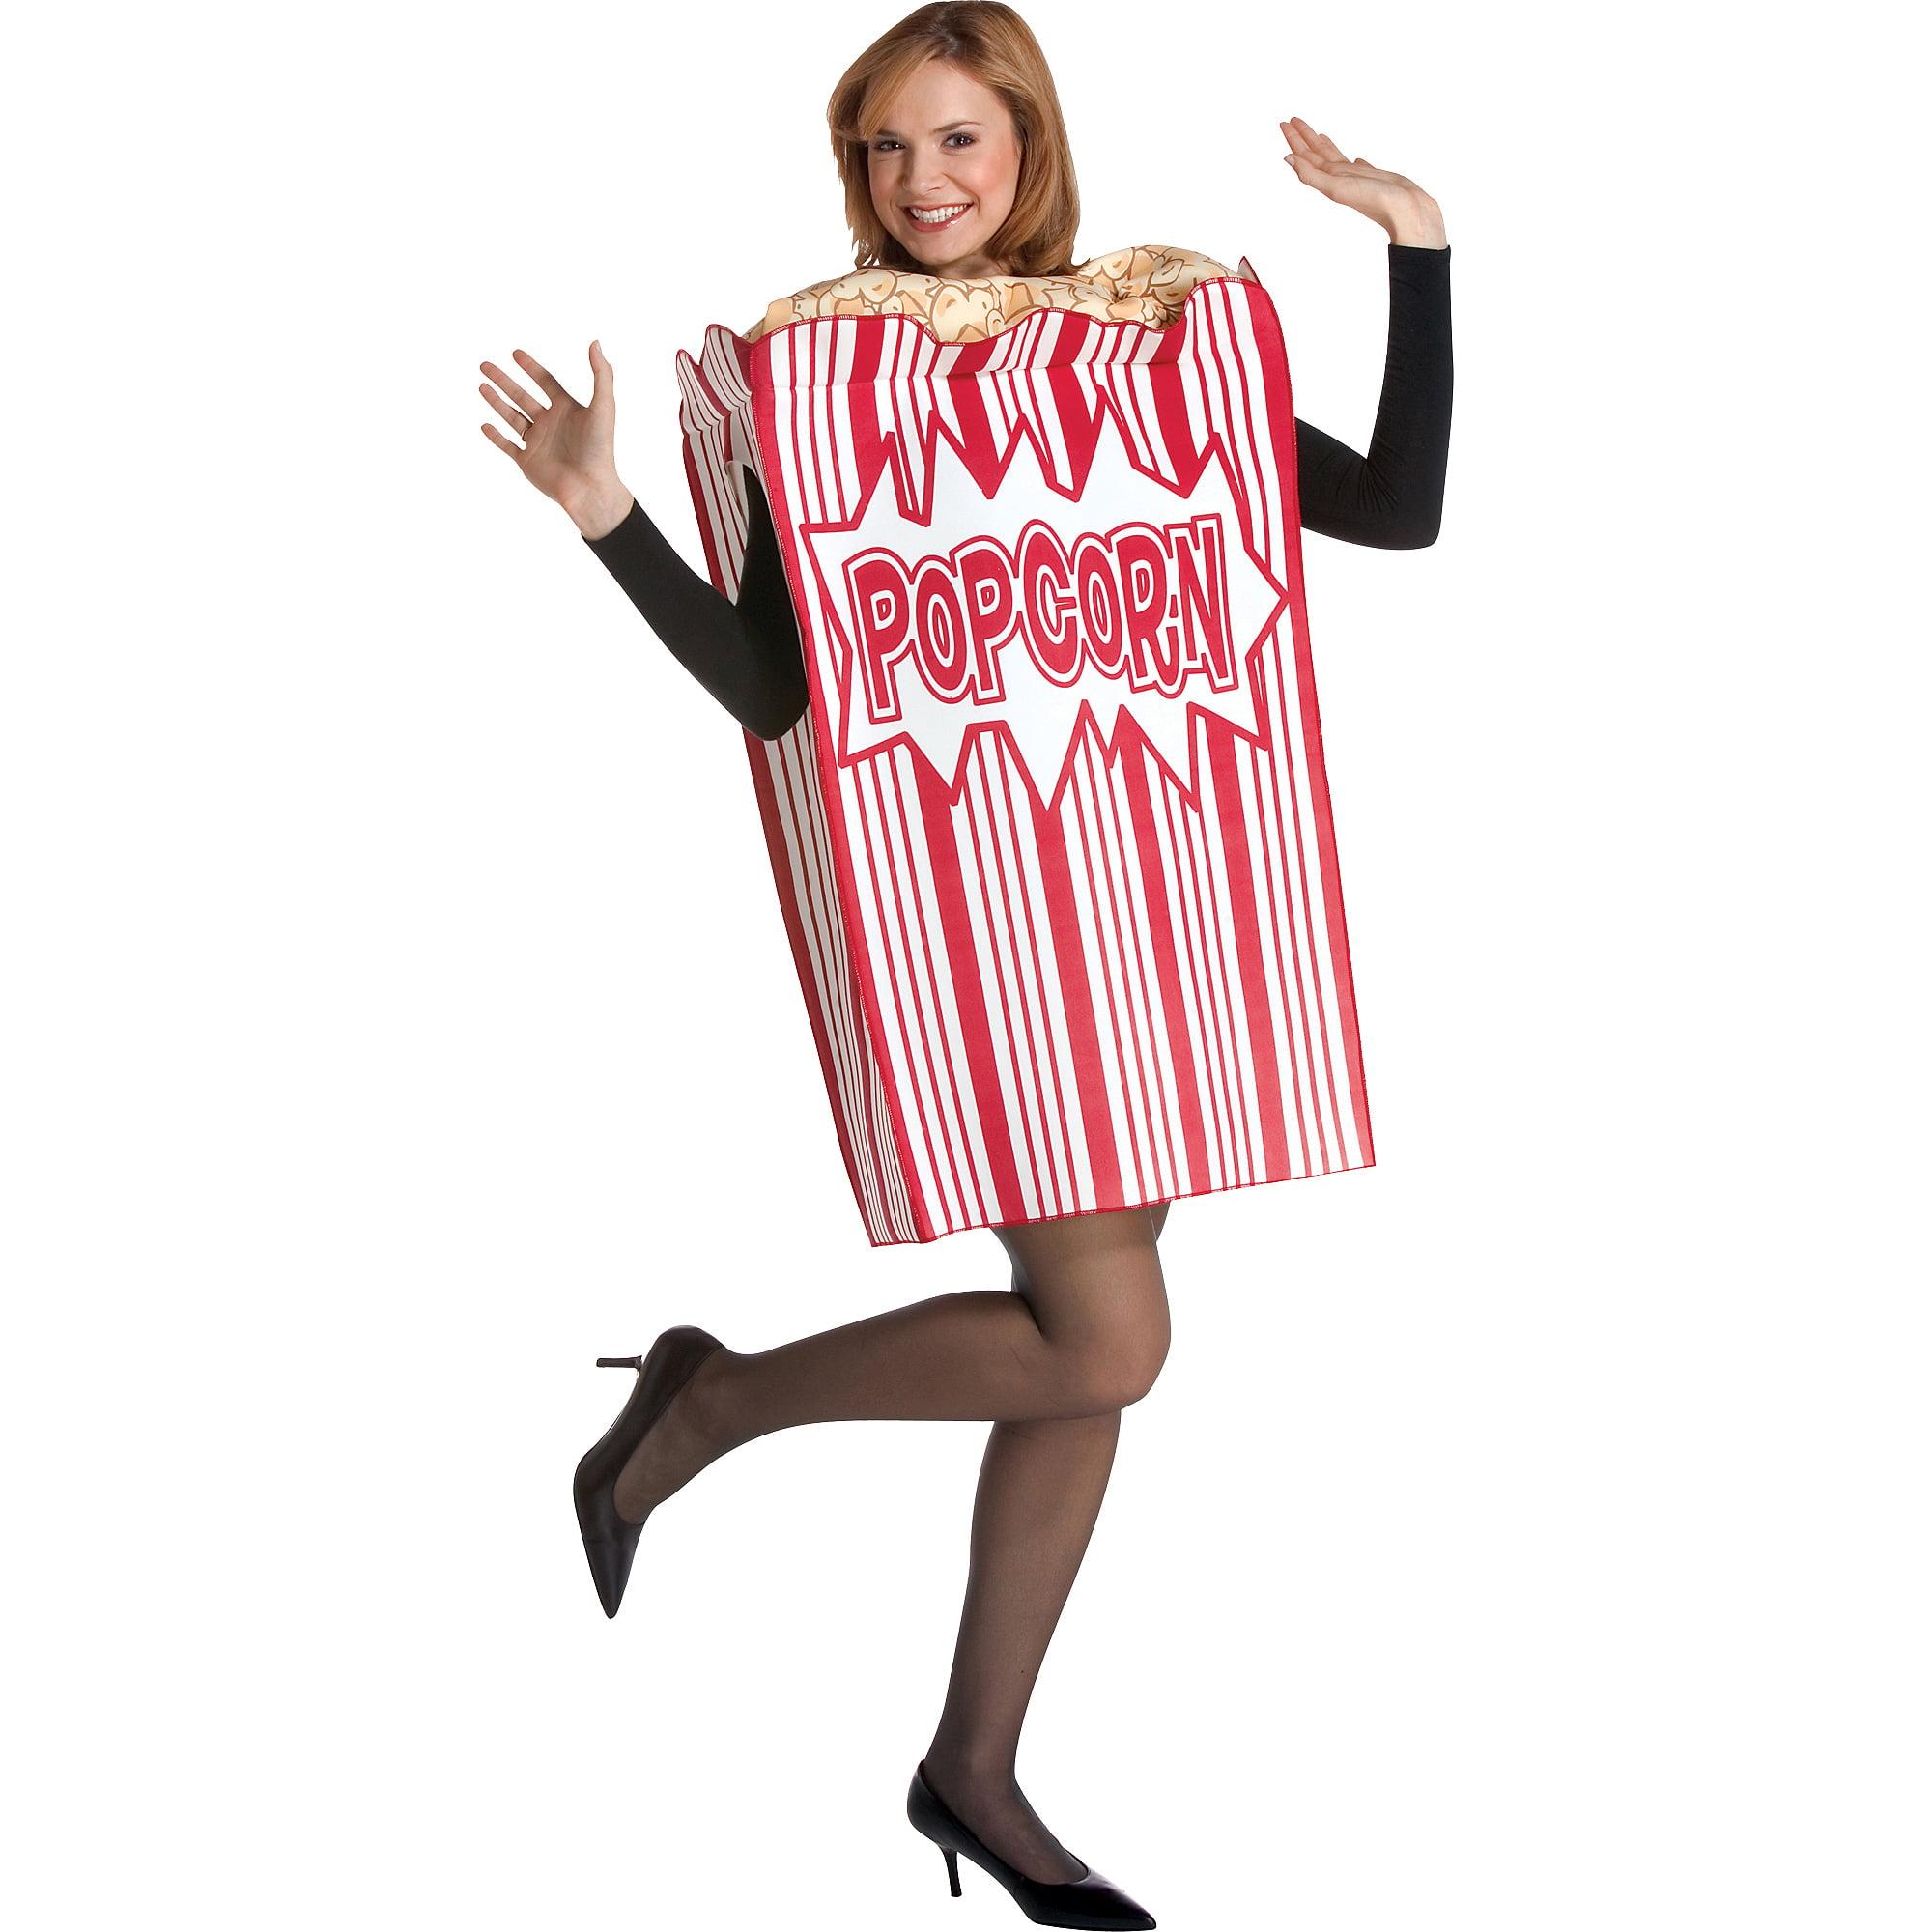 Movie Night Popcorn Adult Halloween Costume